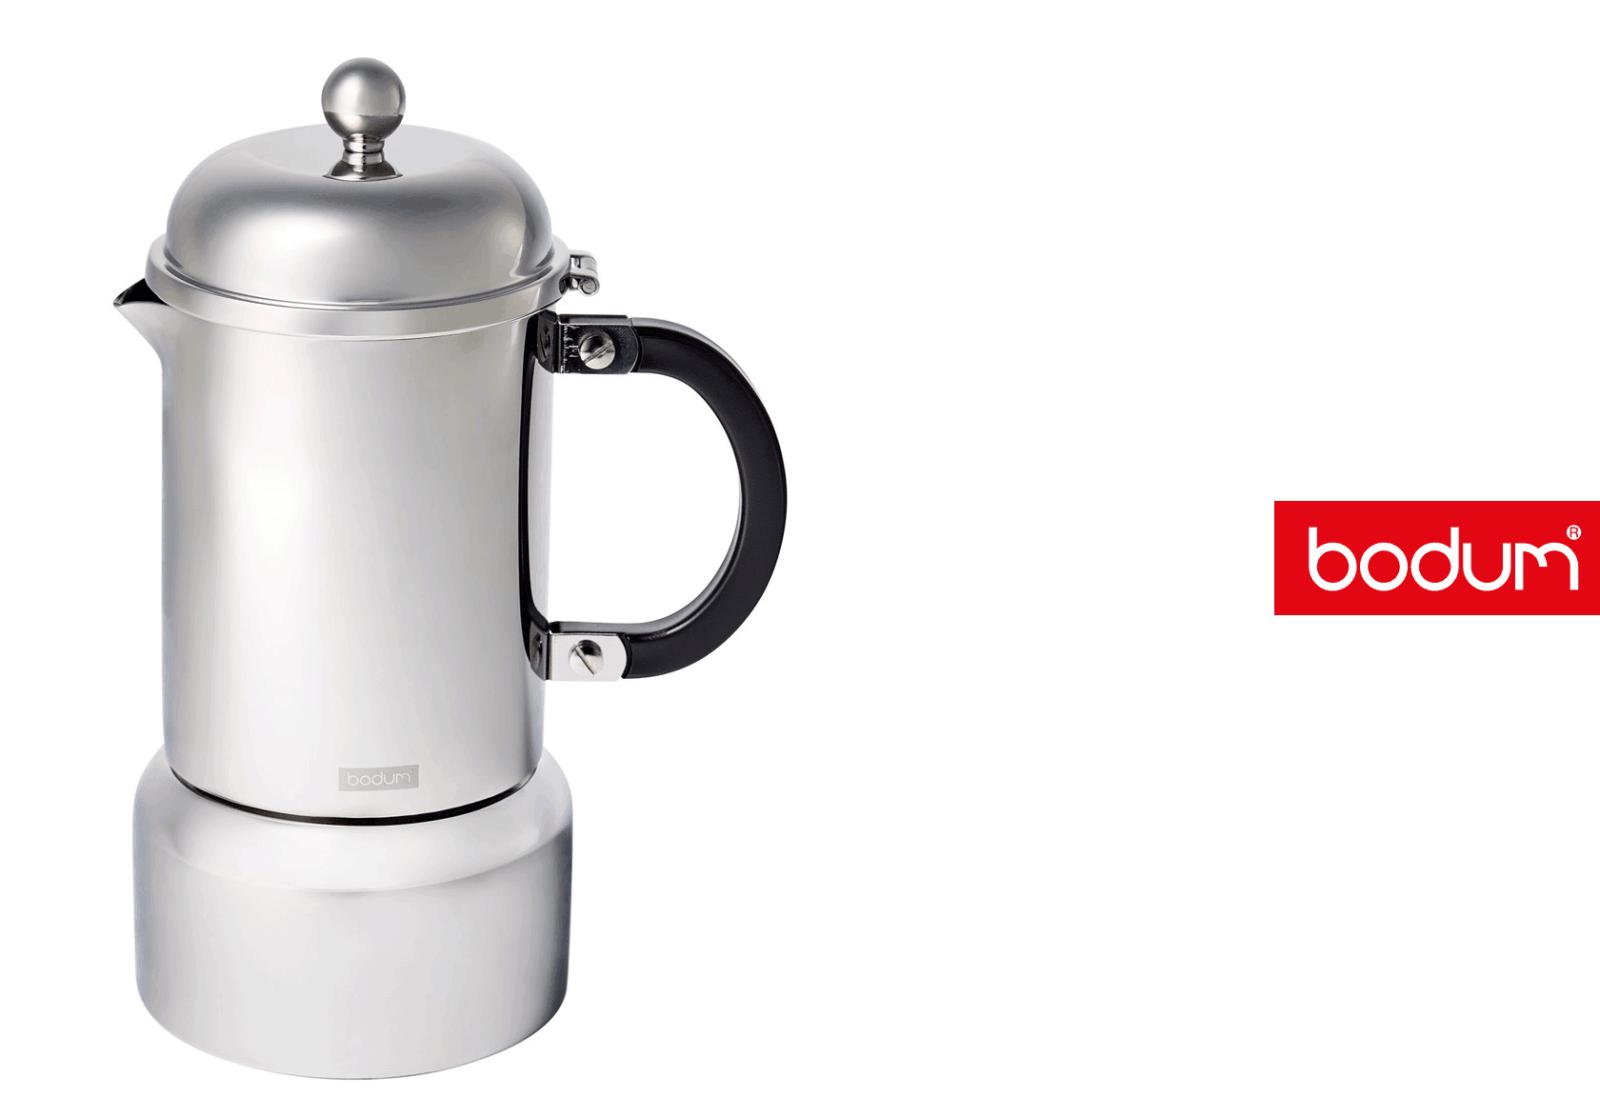 Bodum Recalls Stove Top Espresso Makers Due to Fire and Burn Hazards